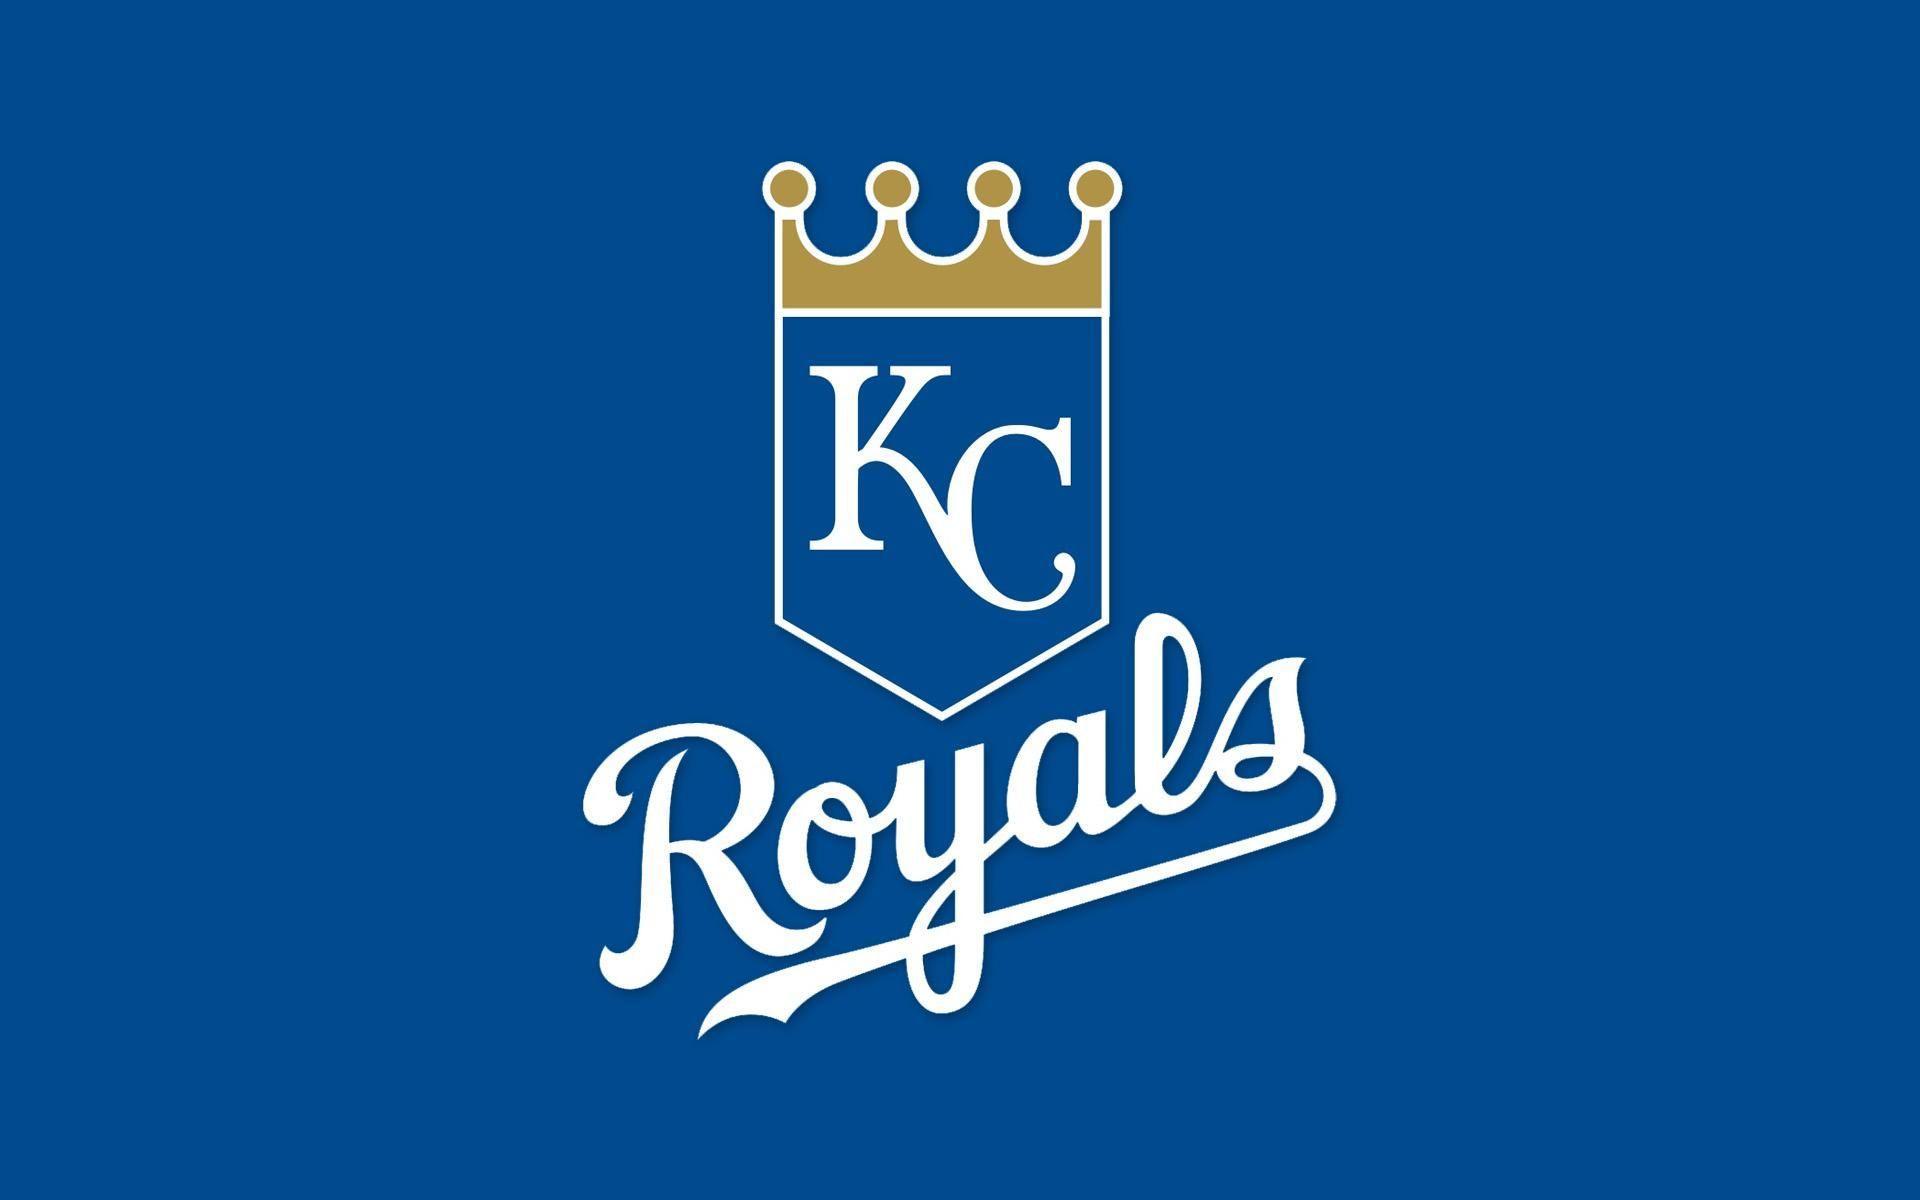 Kansas City Royals Wallpapers on WallpaperDog 1920x1200